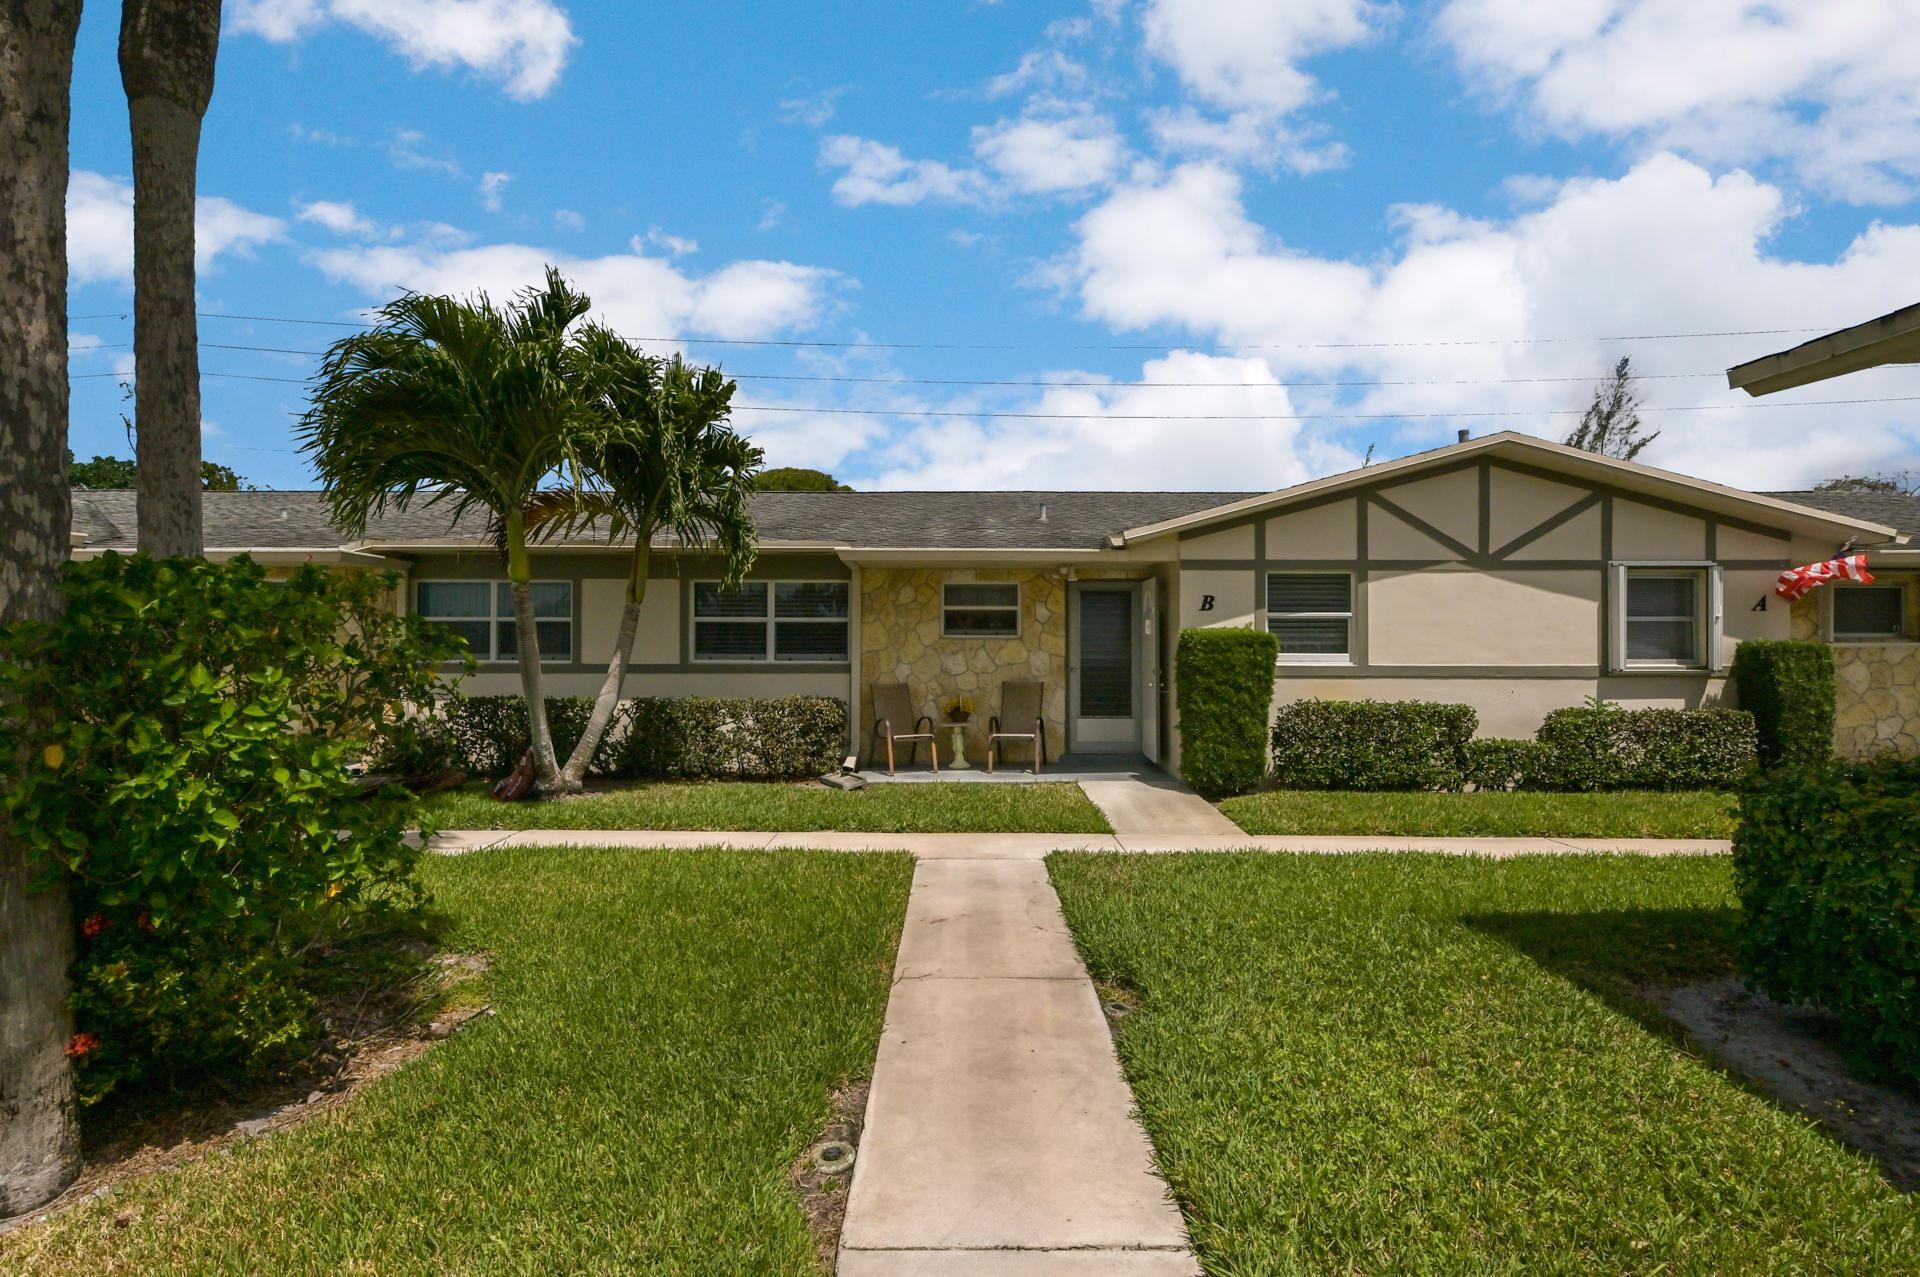 2521 Emory Drive W #B, West Palm Beach, FL 33415 - MLS#: RX-10706234